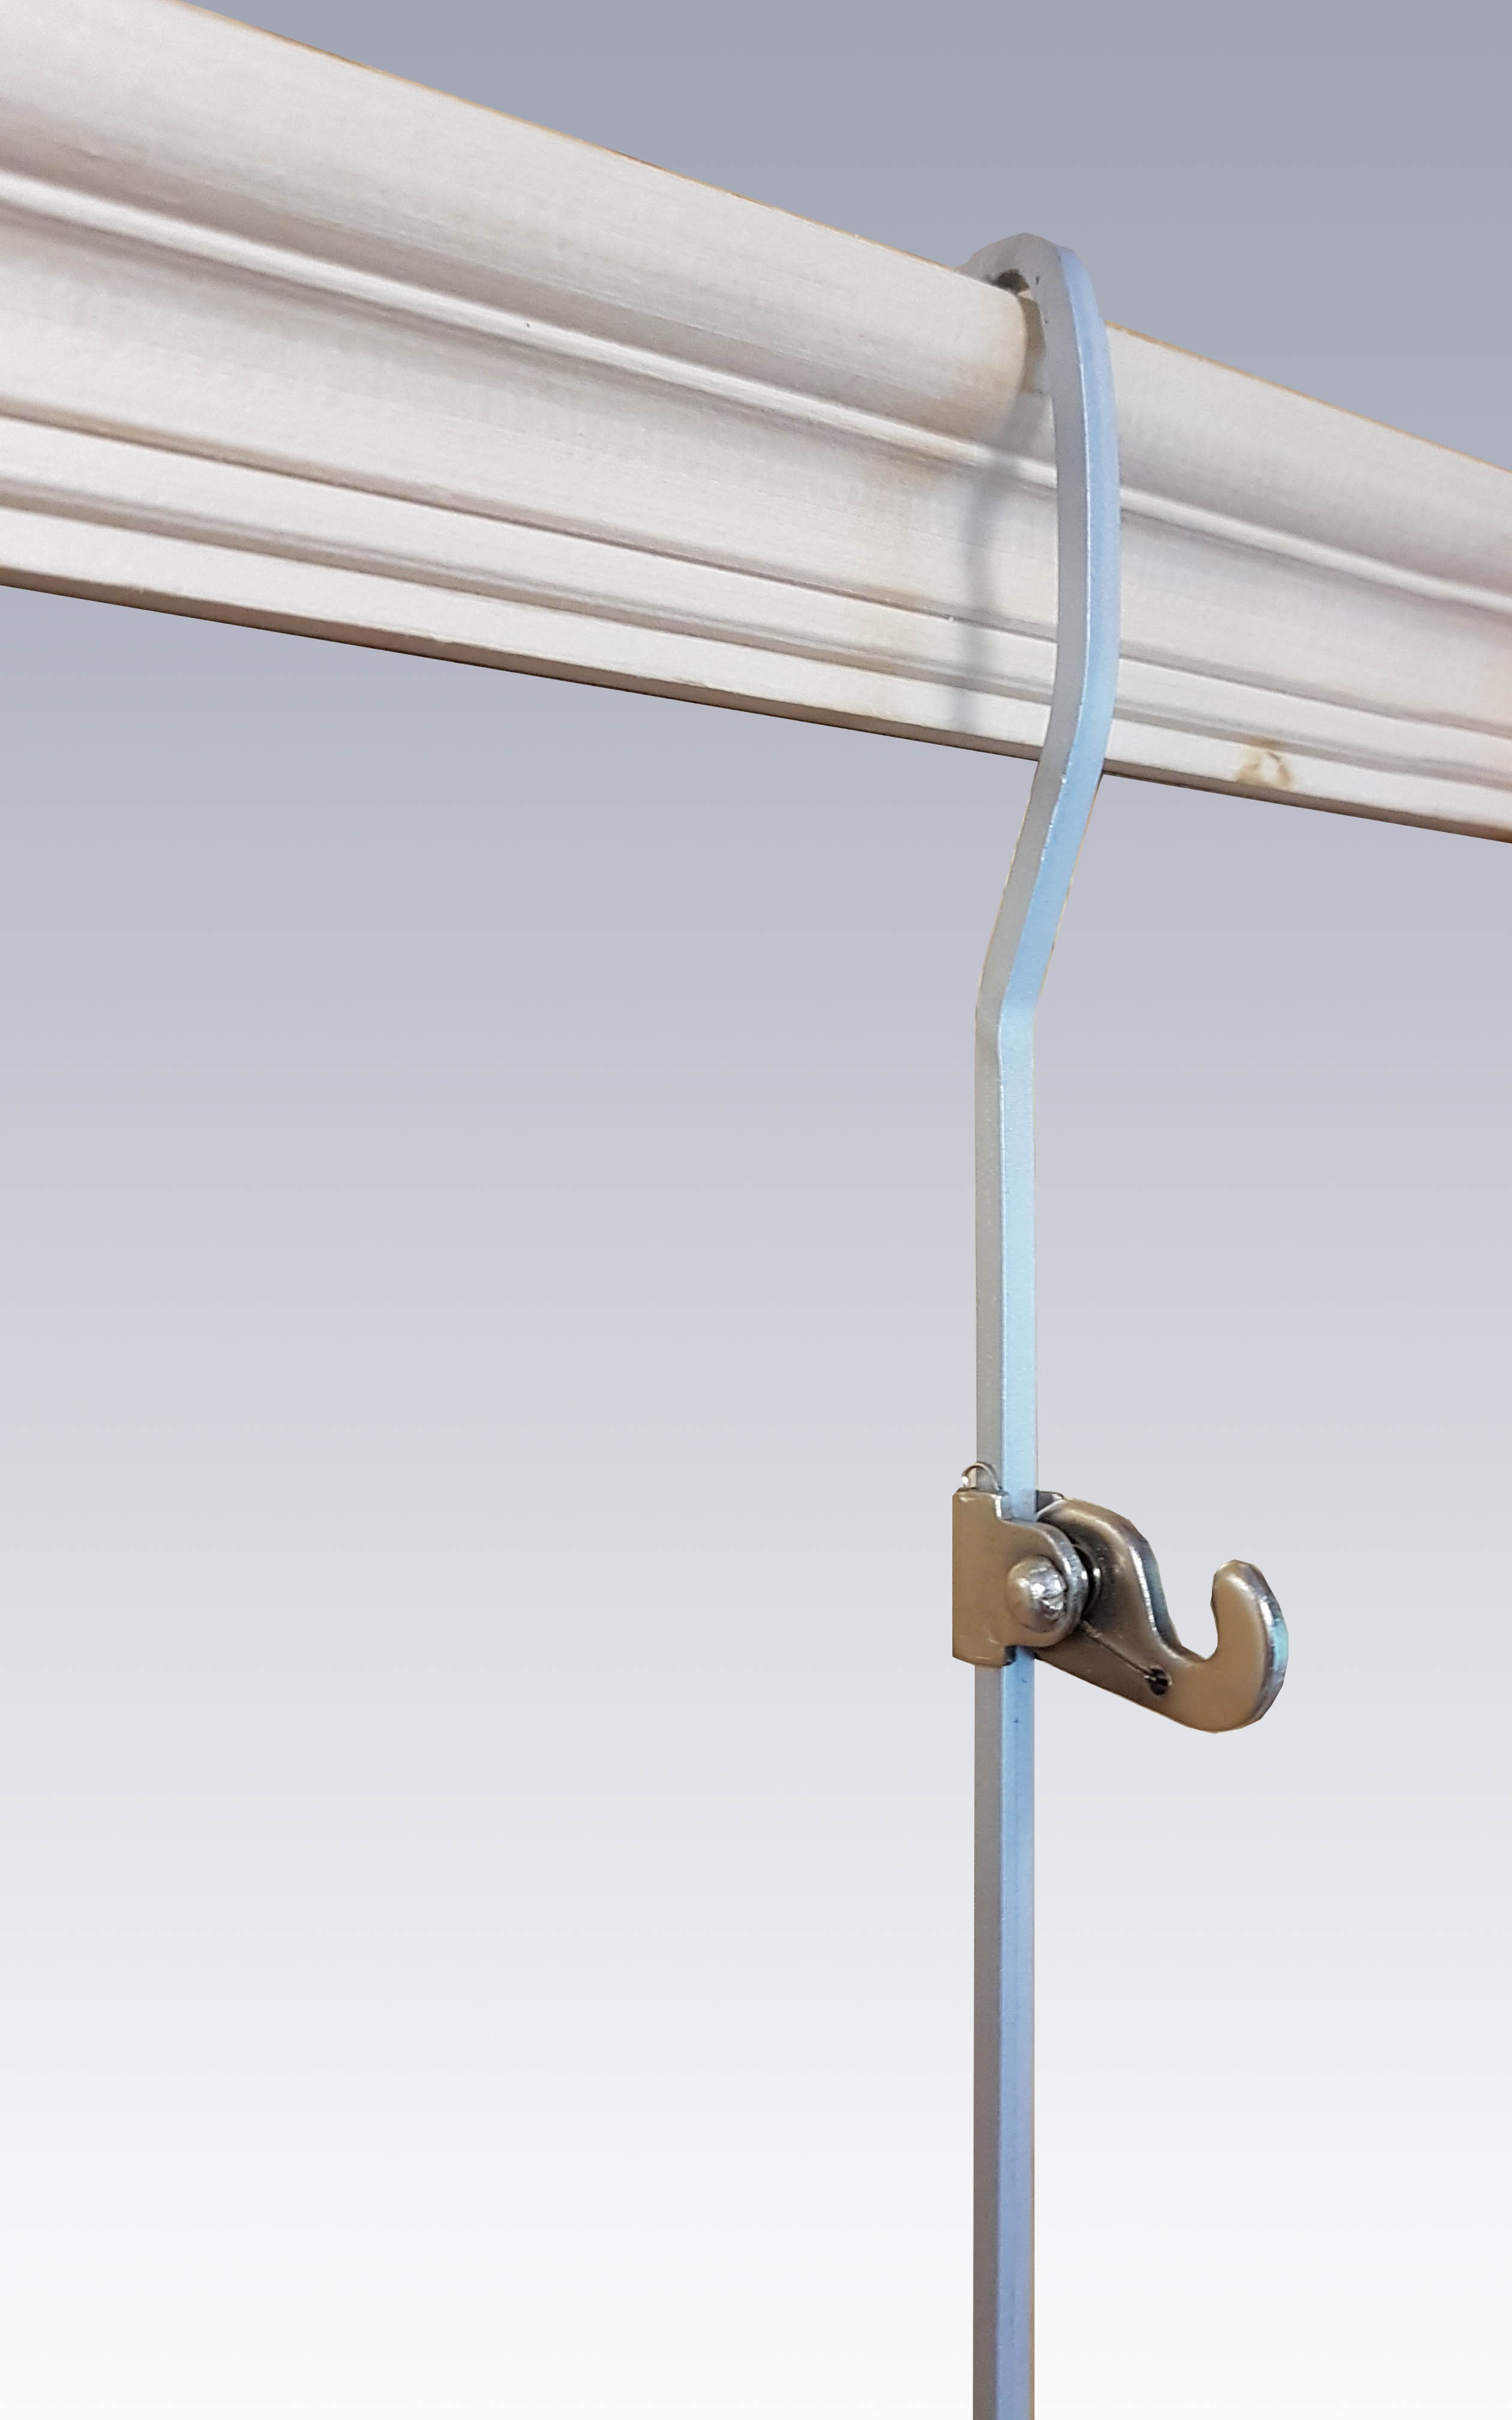 Moulding Rail Picture Hanging Rod 4mm Square Dado Rail Hanging System